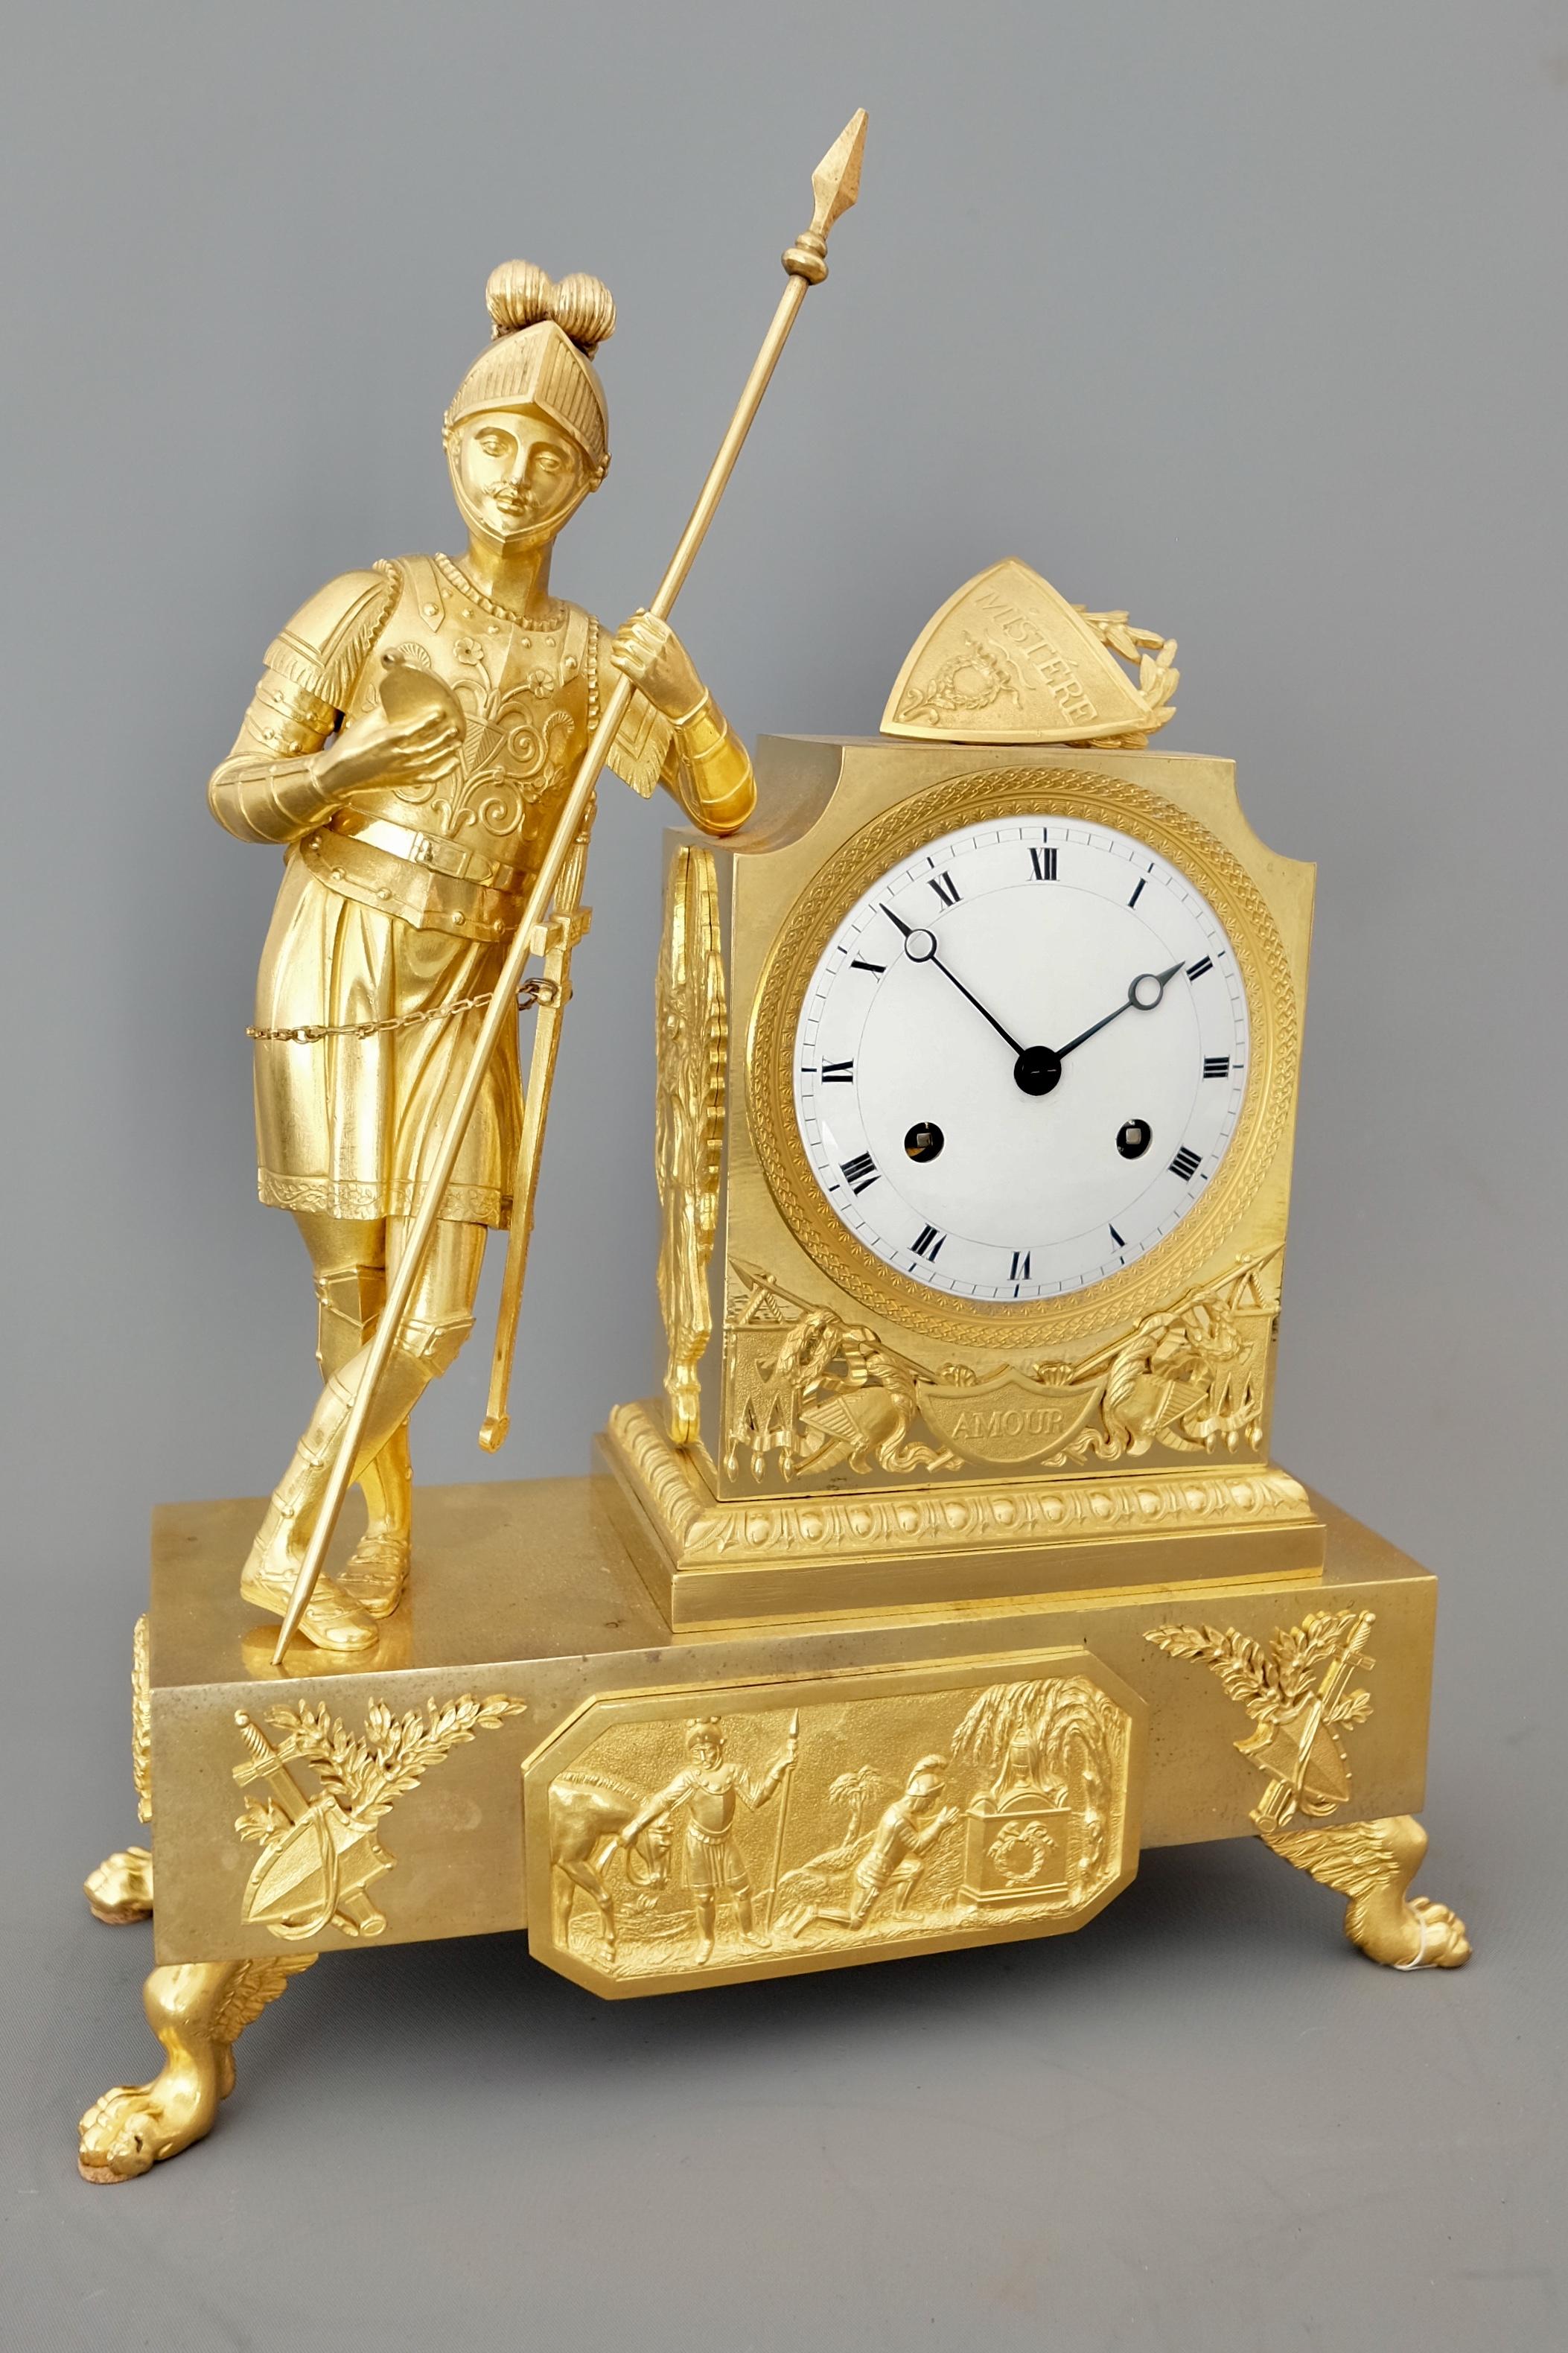 French Striking Figural Mantel Clock